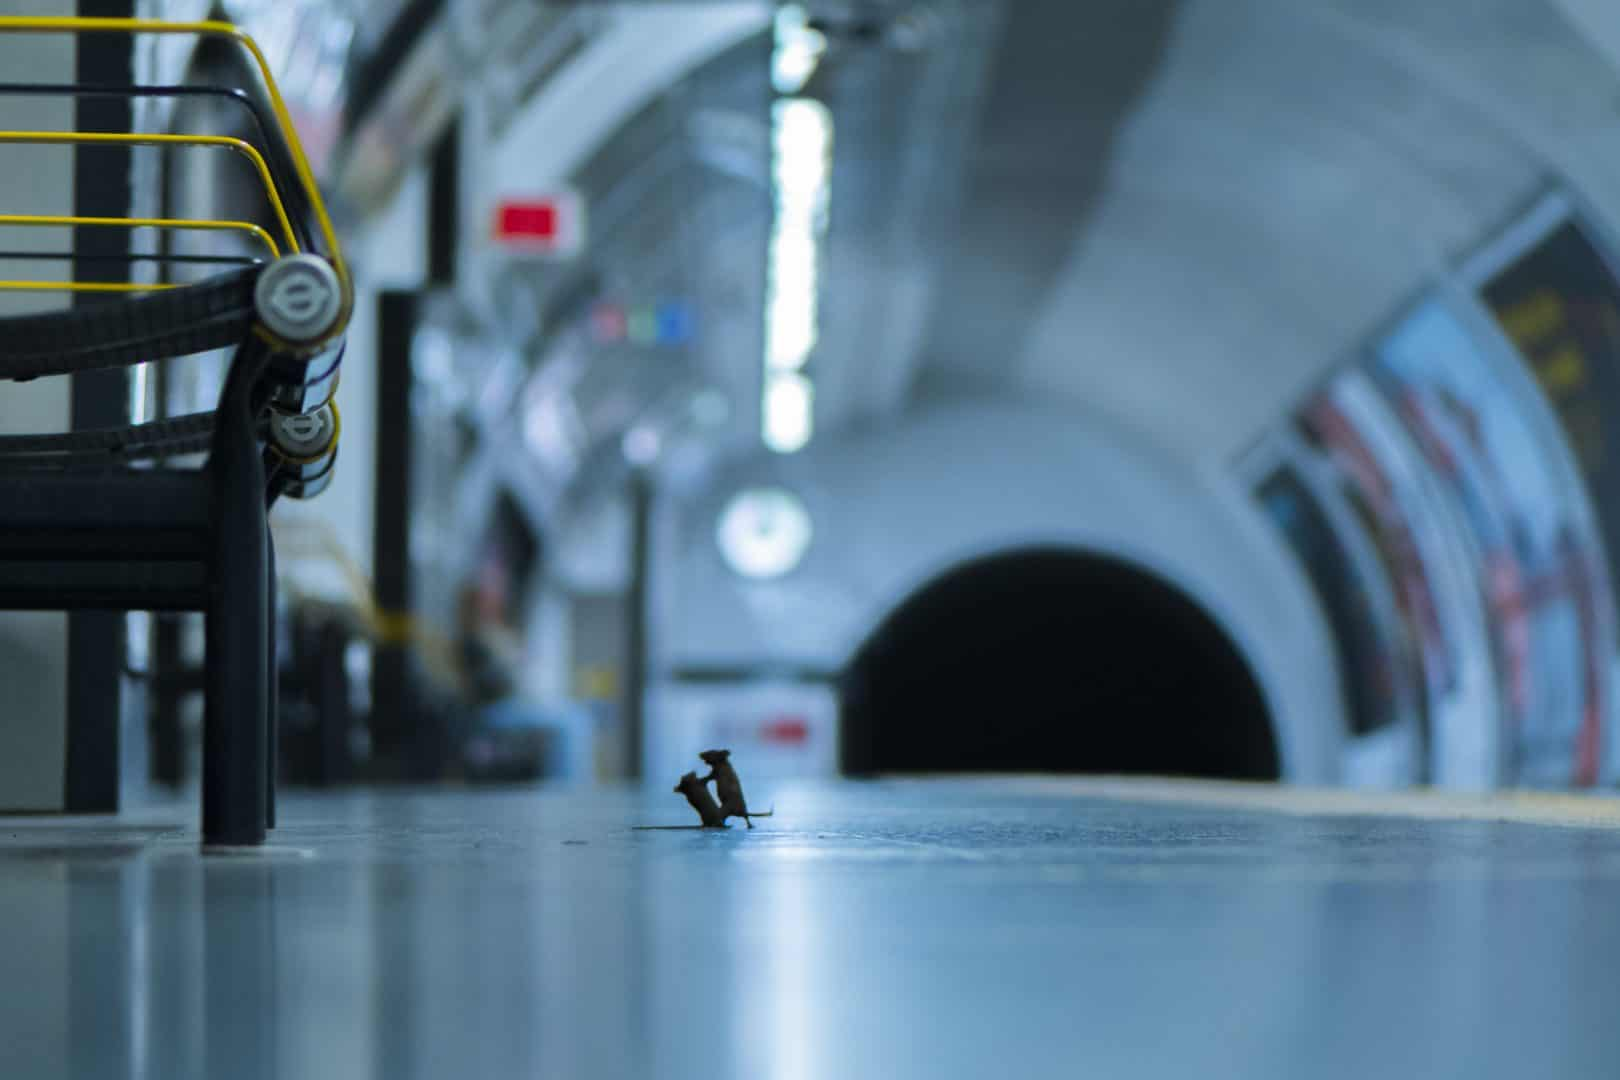 Mice 'squabbling' on Tube station platform win wildlife